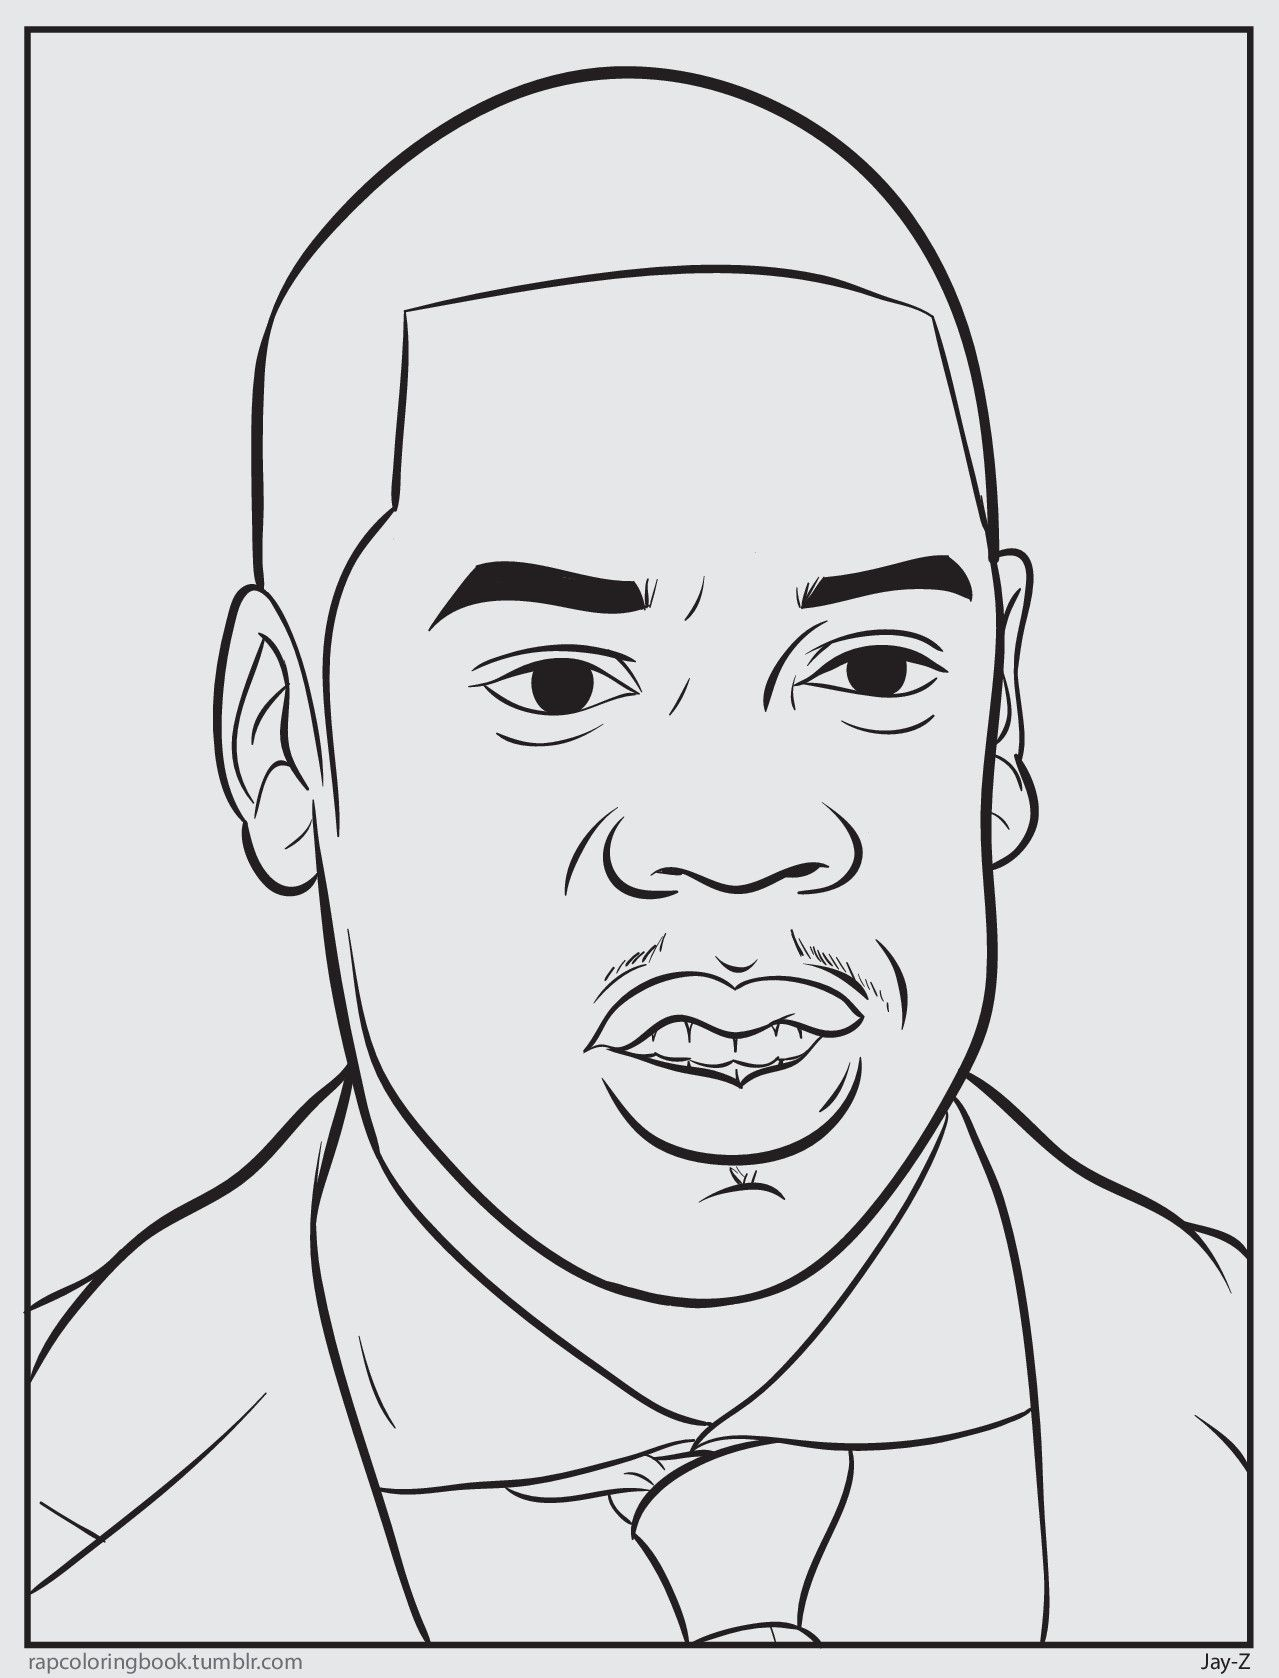 Bun B S Jumbo Coloring And Rap Activity Tumblr Jay Z